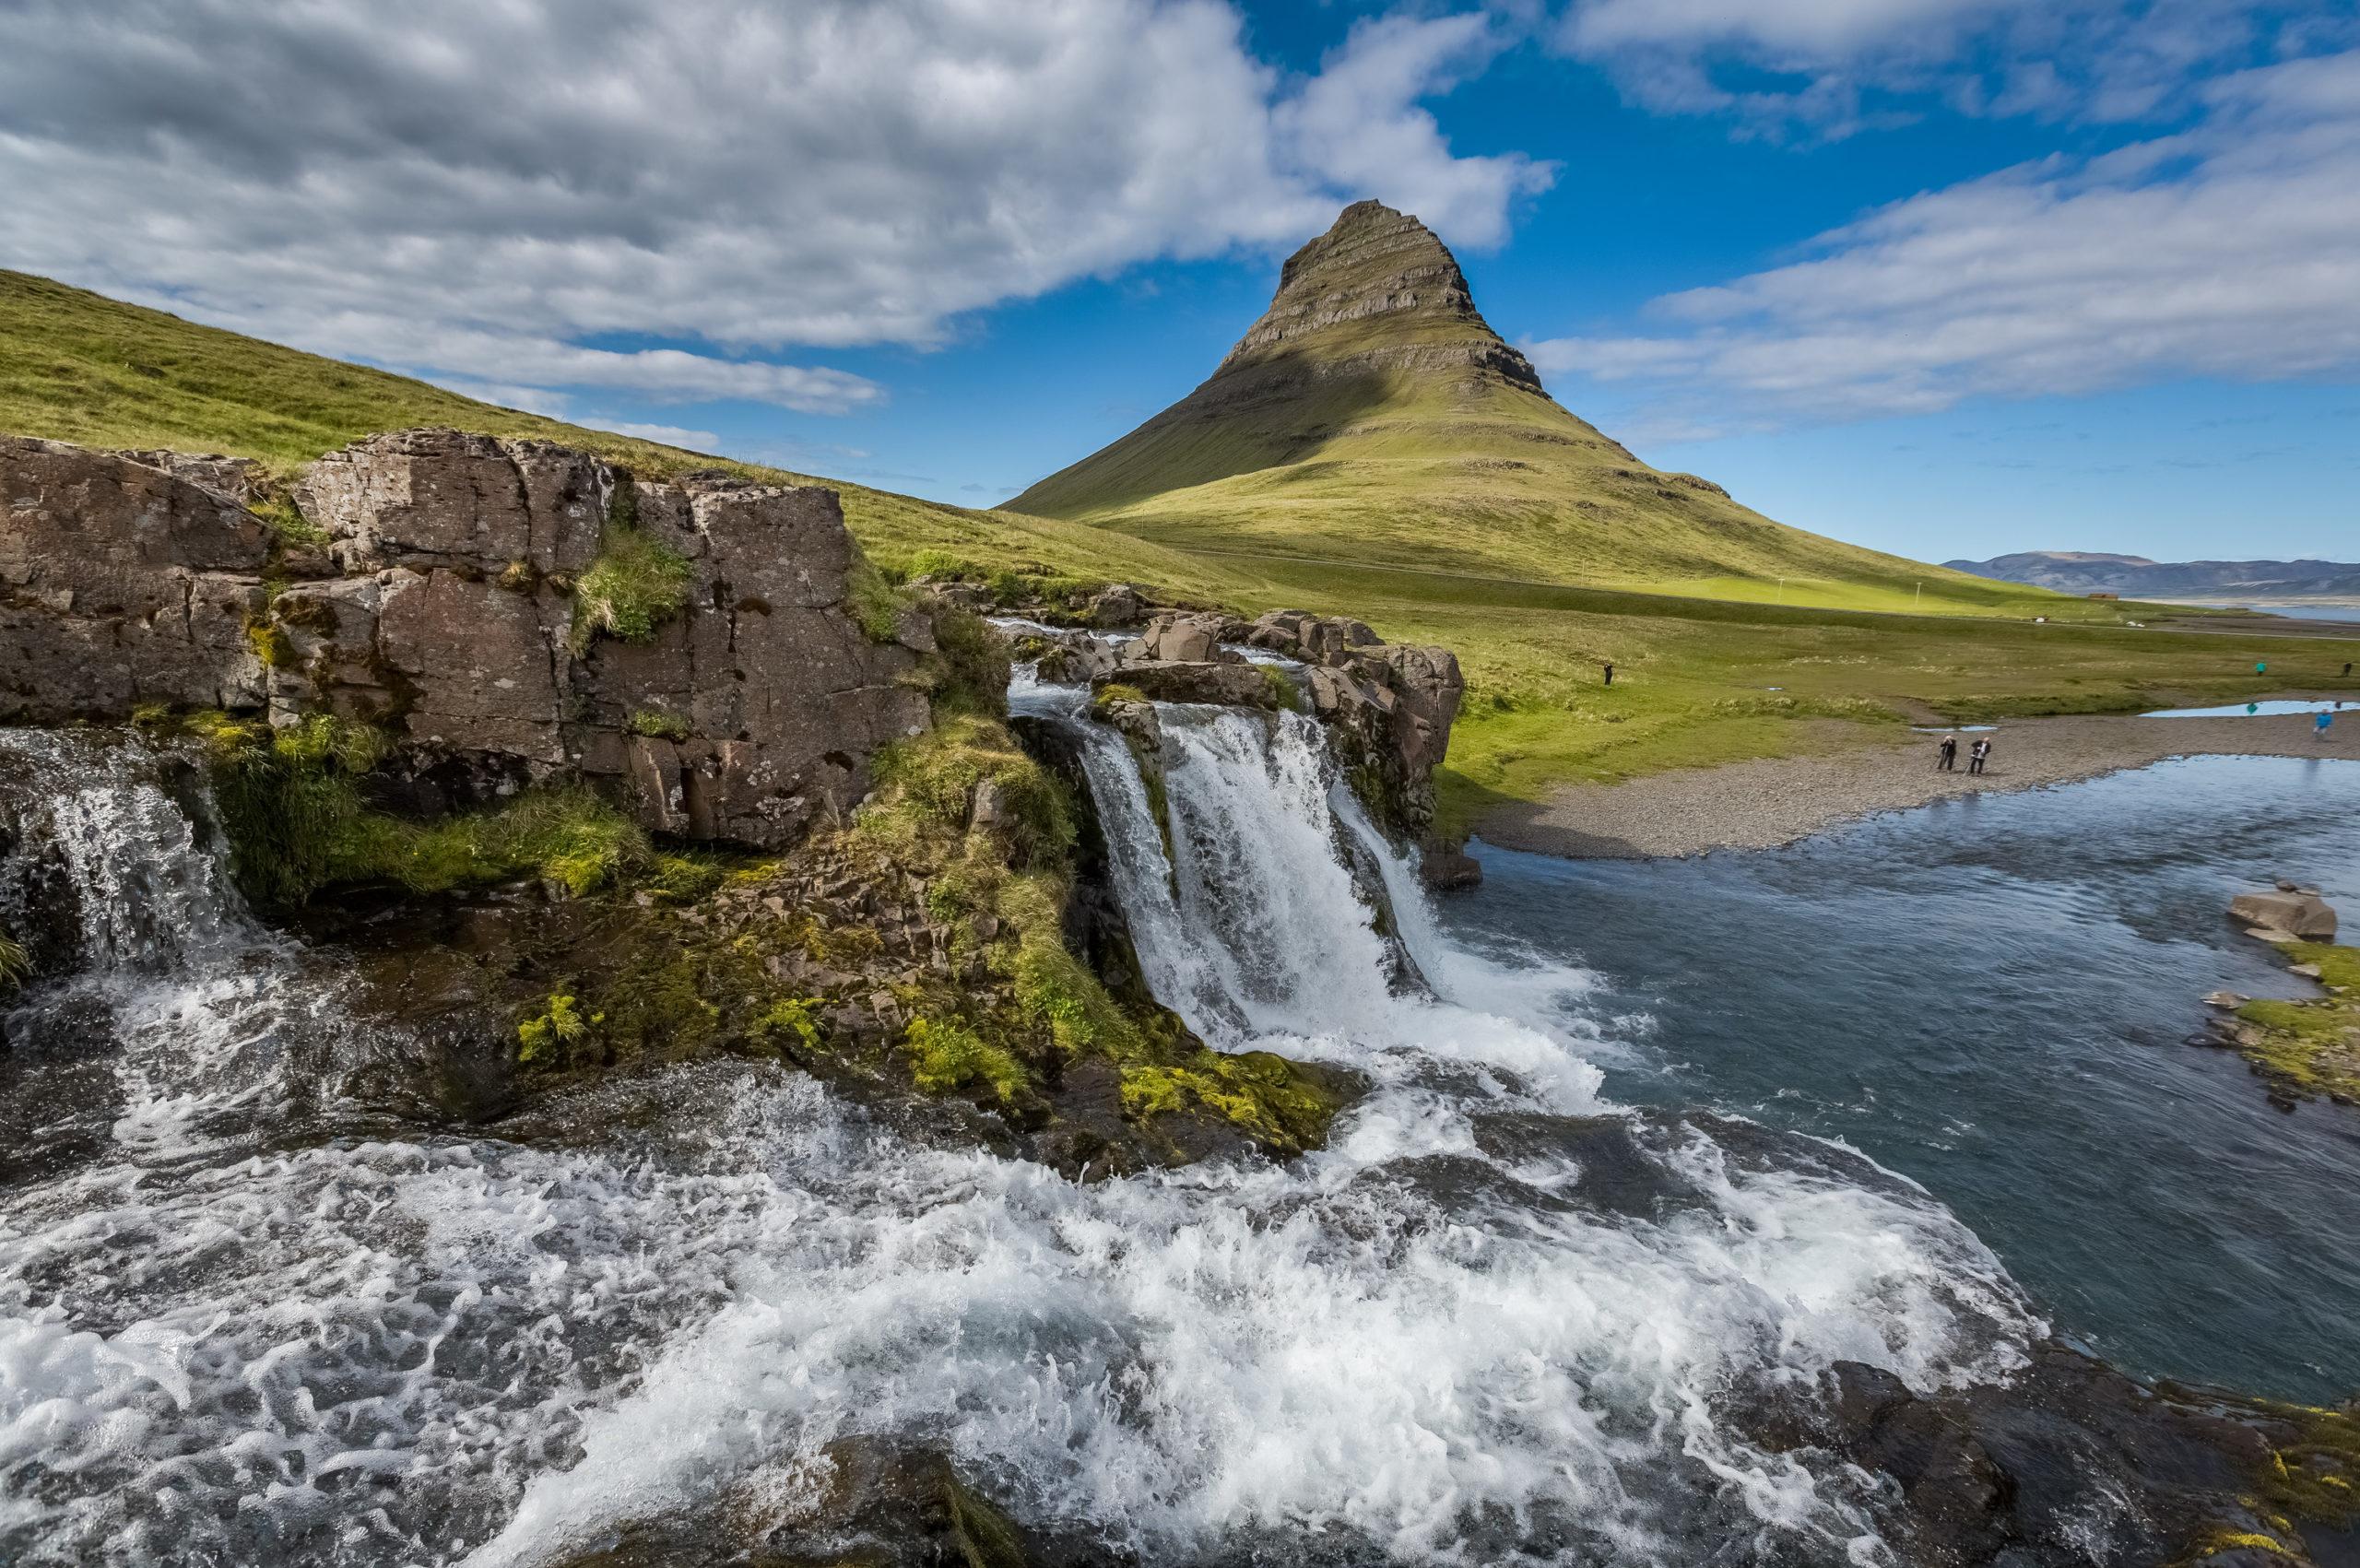 Islande kirkjufellsfoss-sumarid-2013-80-edit-1